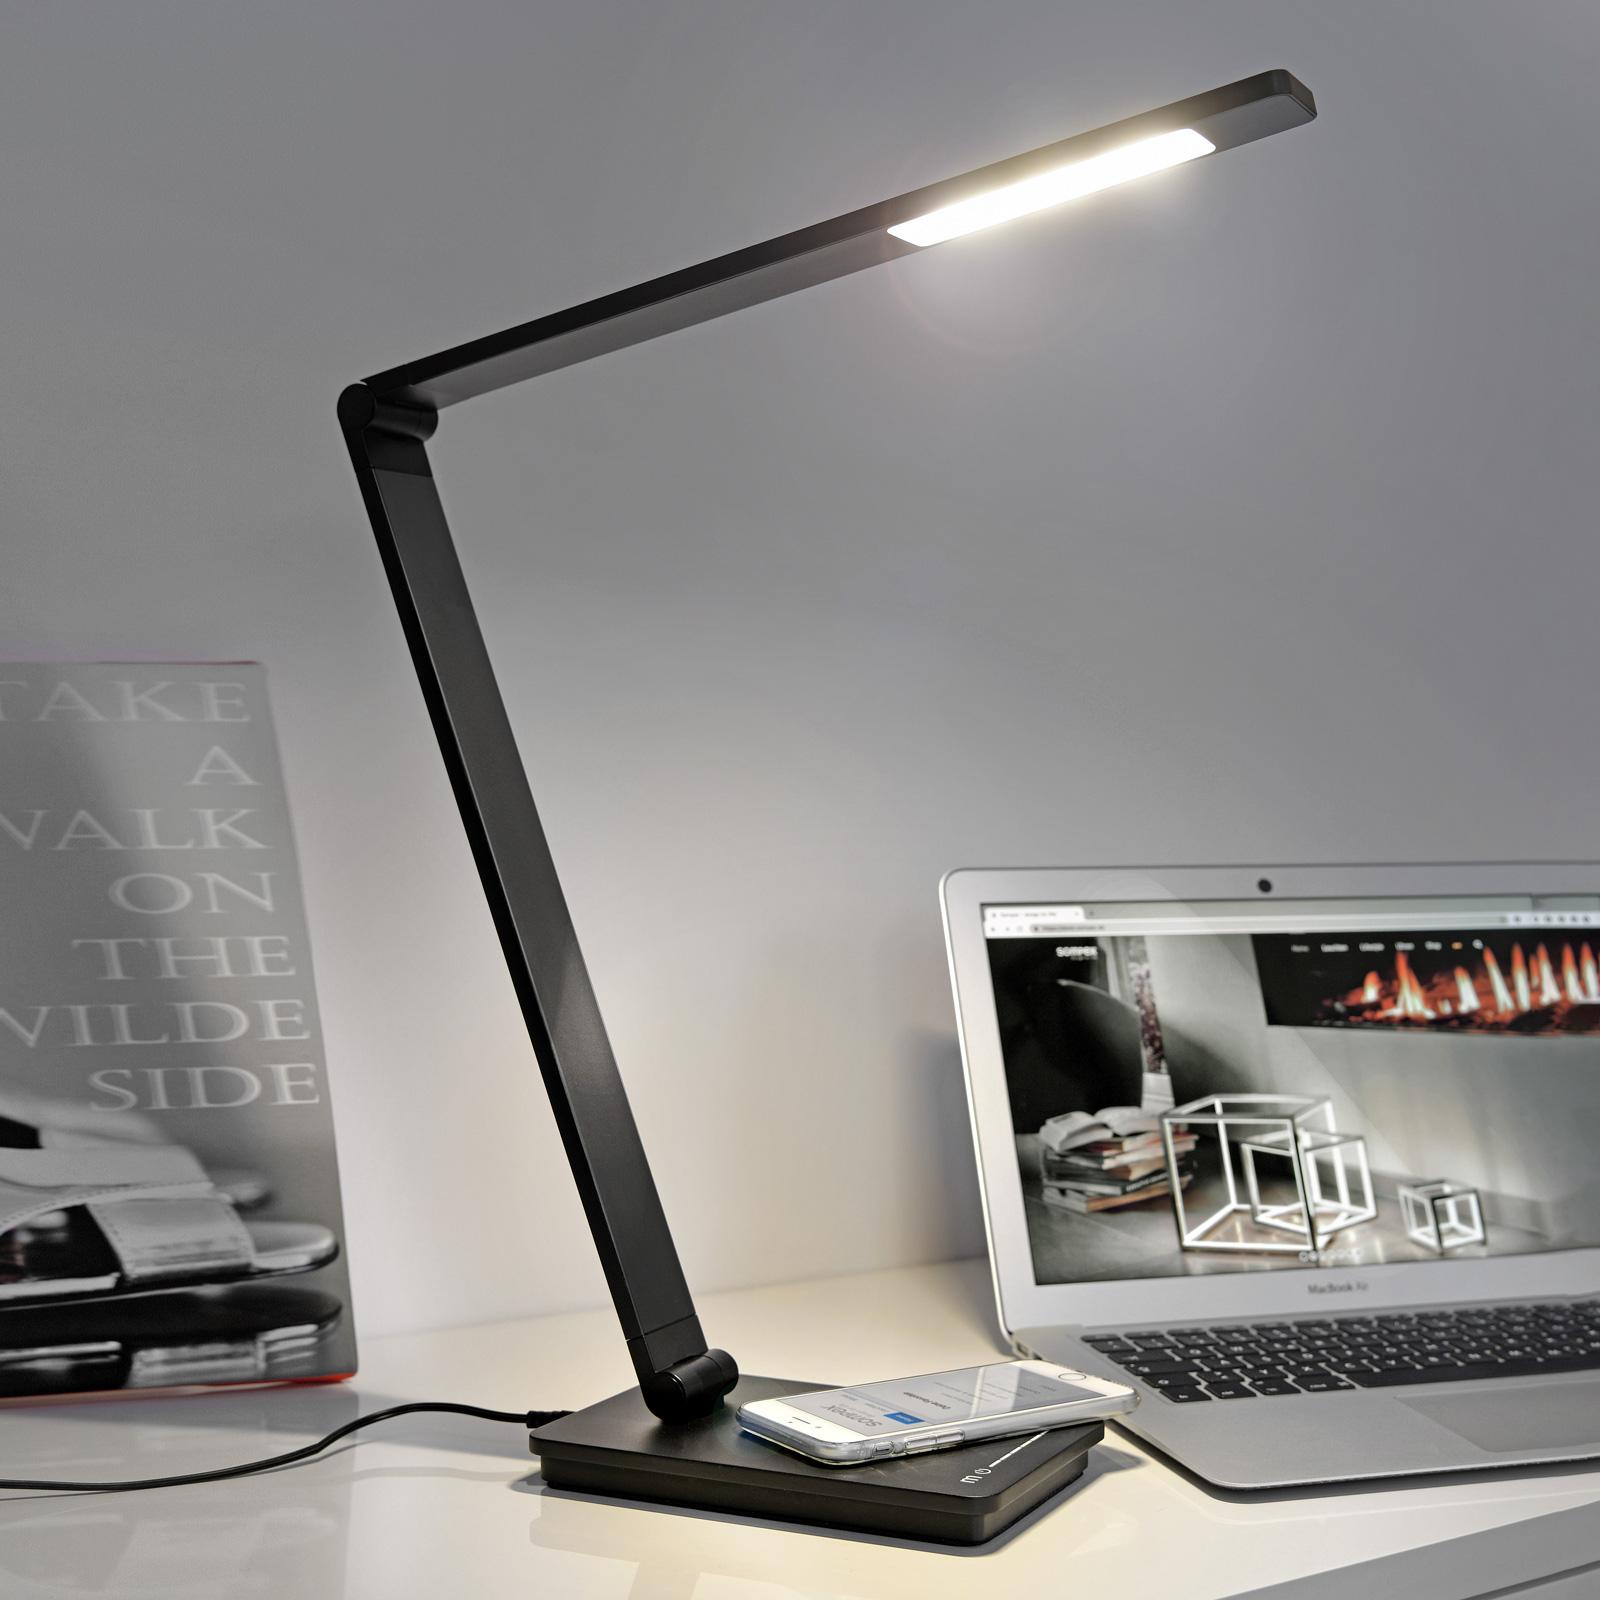 Skrivebordslampe Uli Phone, QI-ladestasjon, svart